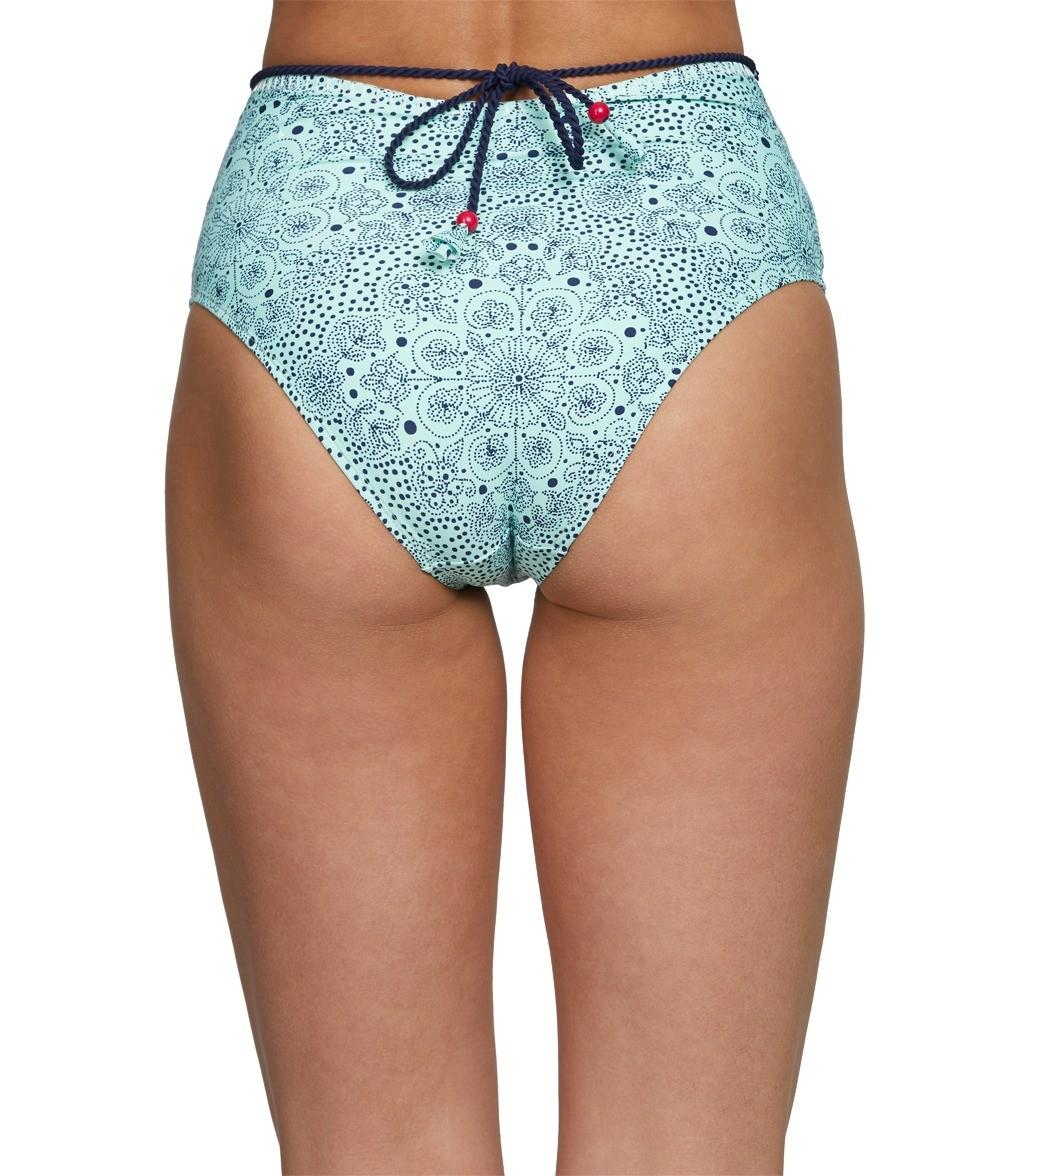 0e61b8ca1425e Anne Cole Mykonos Medallion High Waisted Bikini Bottom at SwimOutlet ...